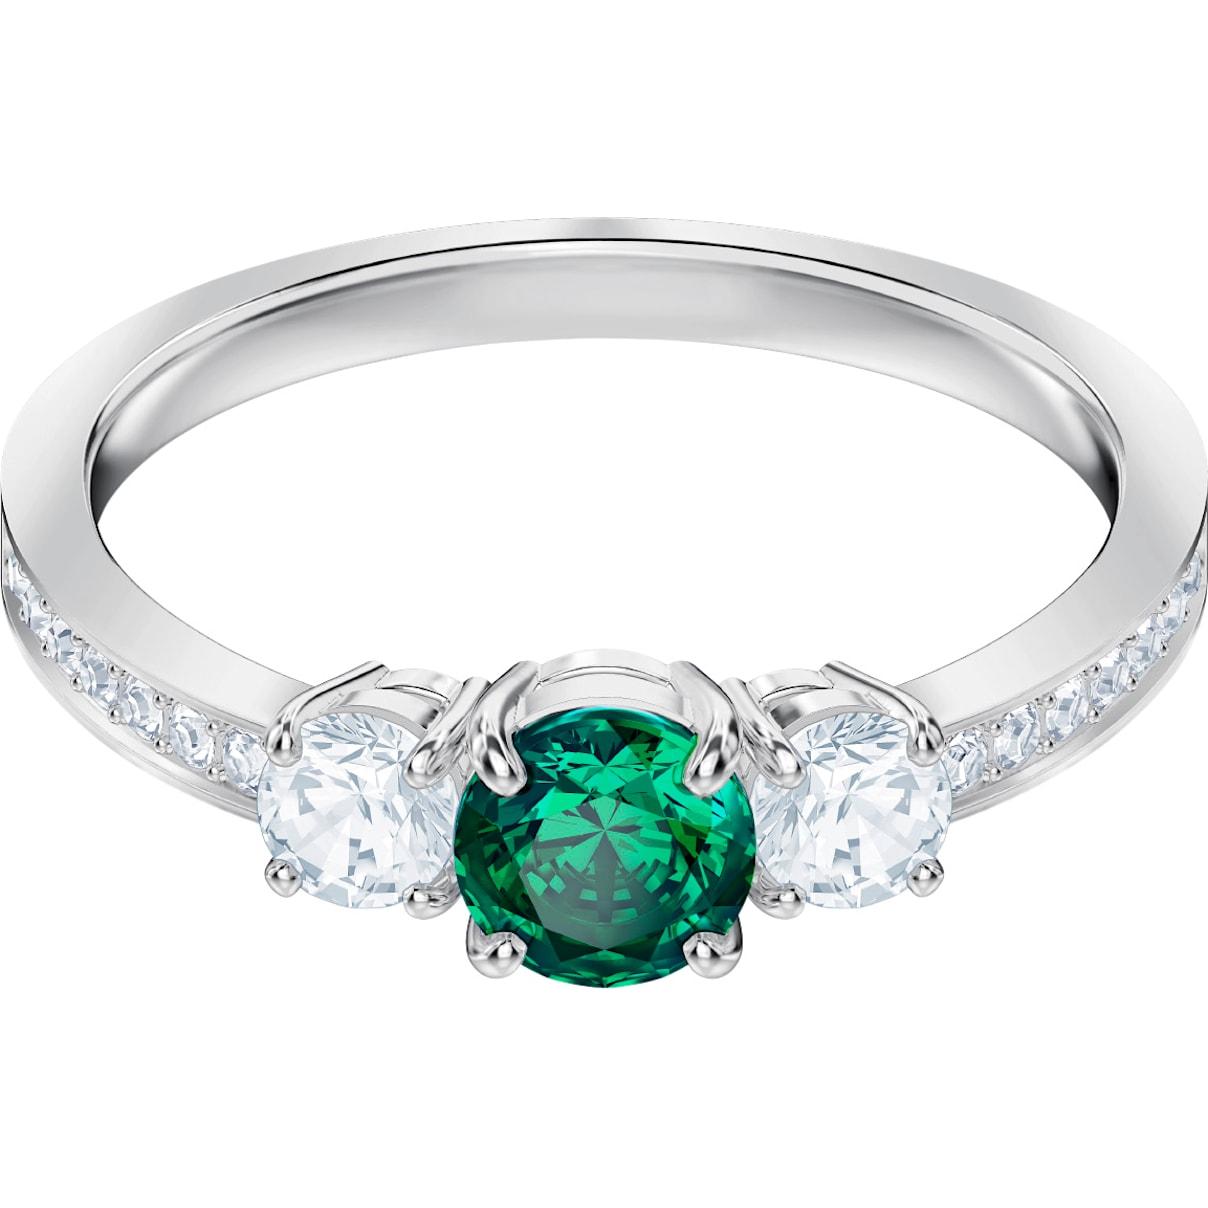 Swarovski Attract Trilogy Round Ring, Green, Rhodium plated